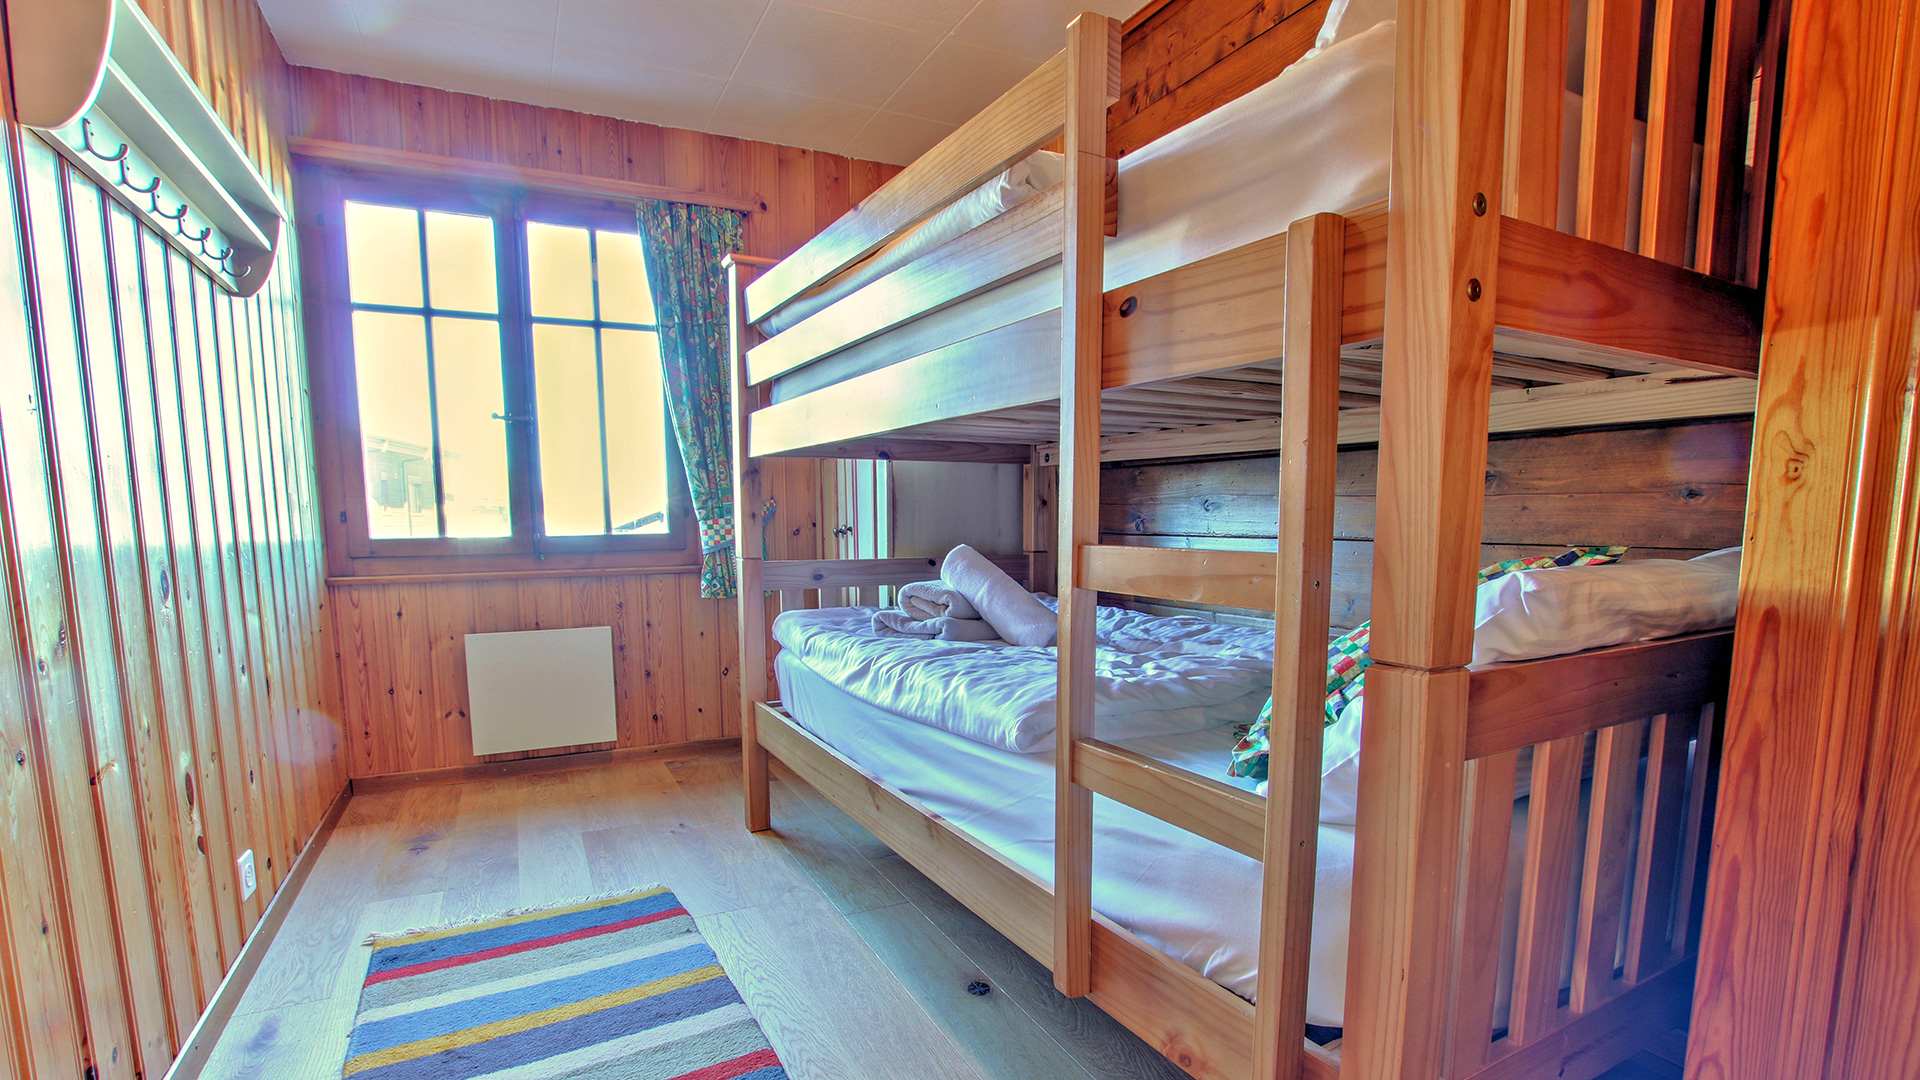 Maison d'Hotes Chalet, Switzerland